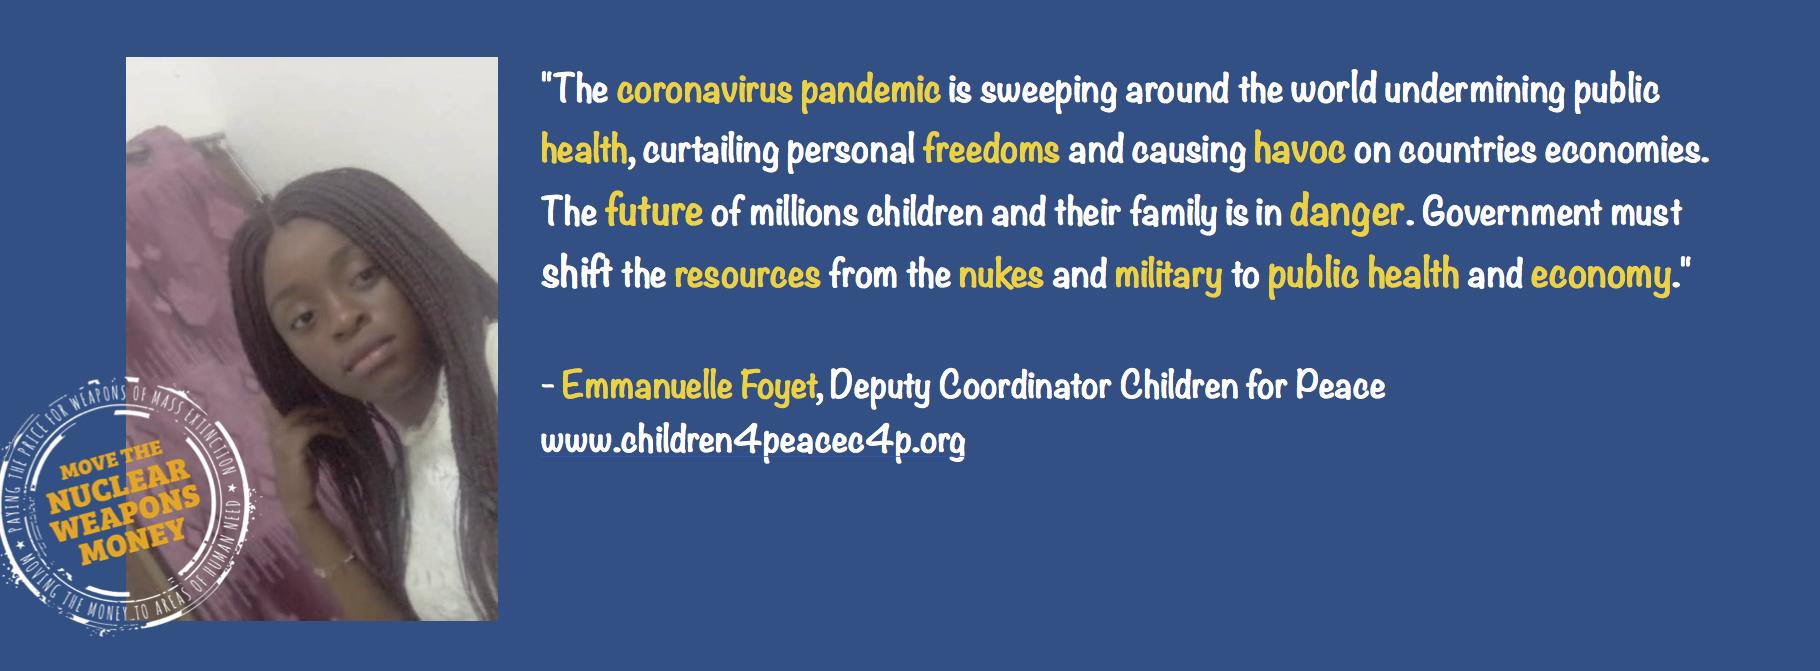 Emmanuelle-Foyet-Deputy-Coordinator-of-Children-for-Peace